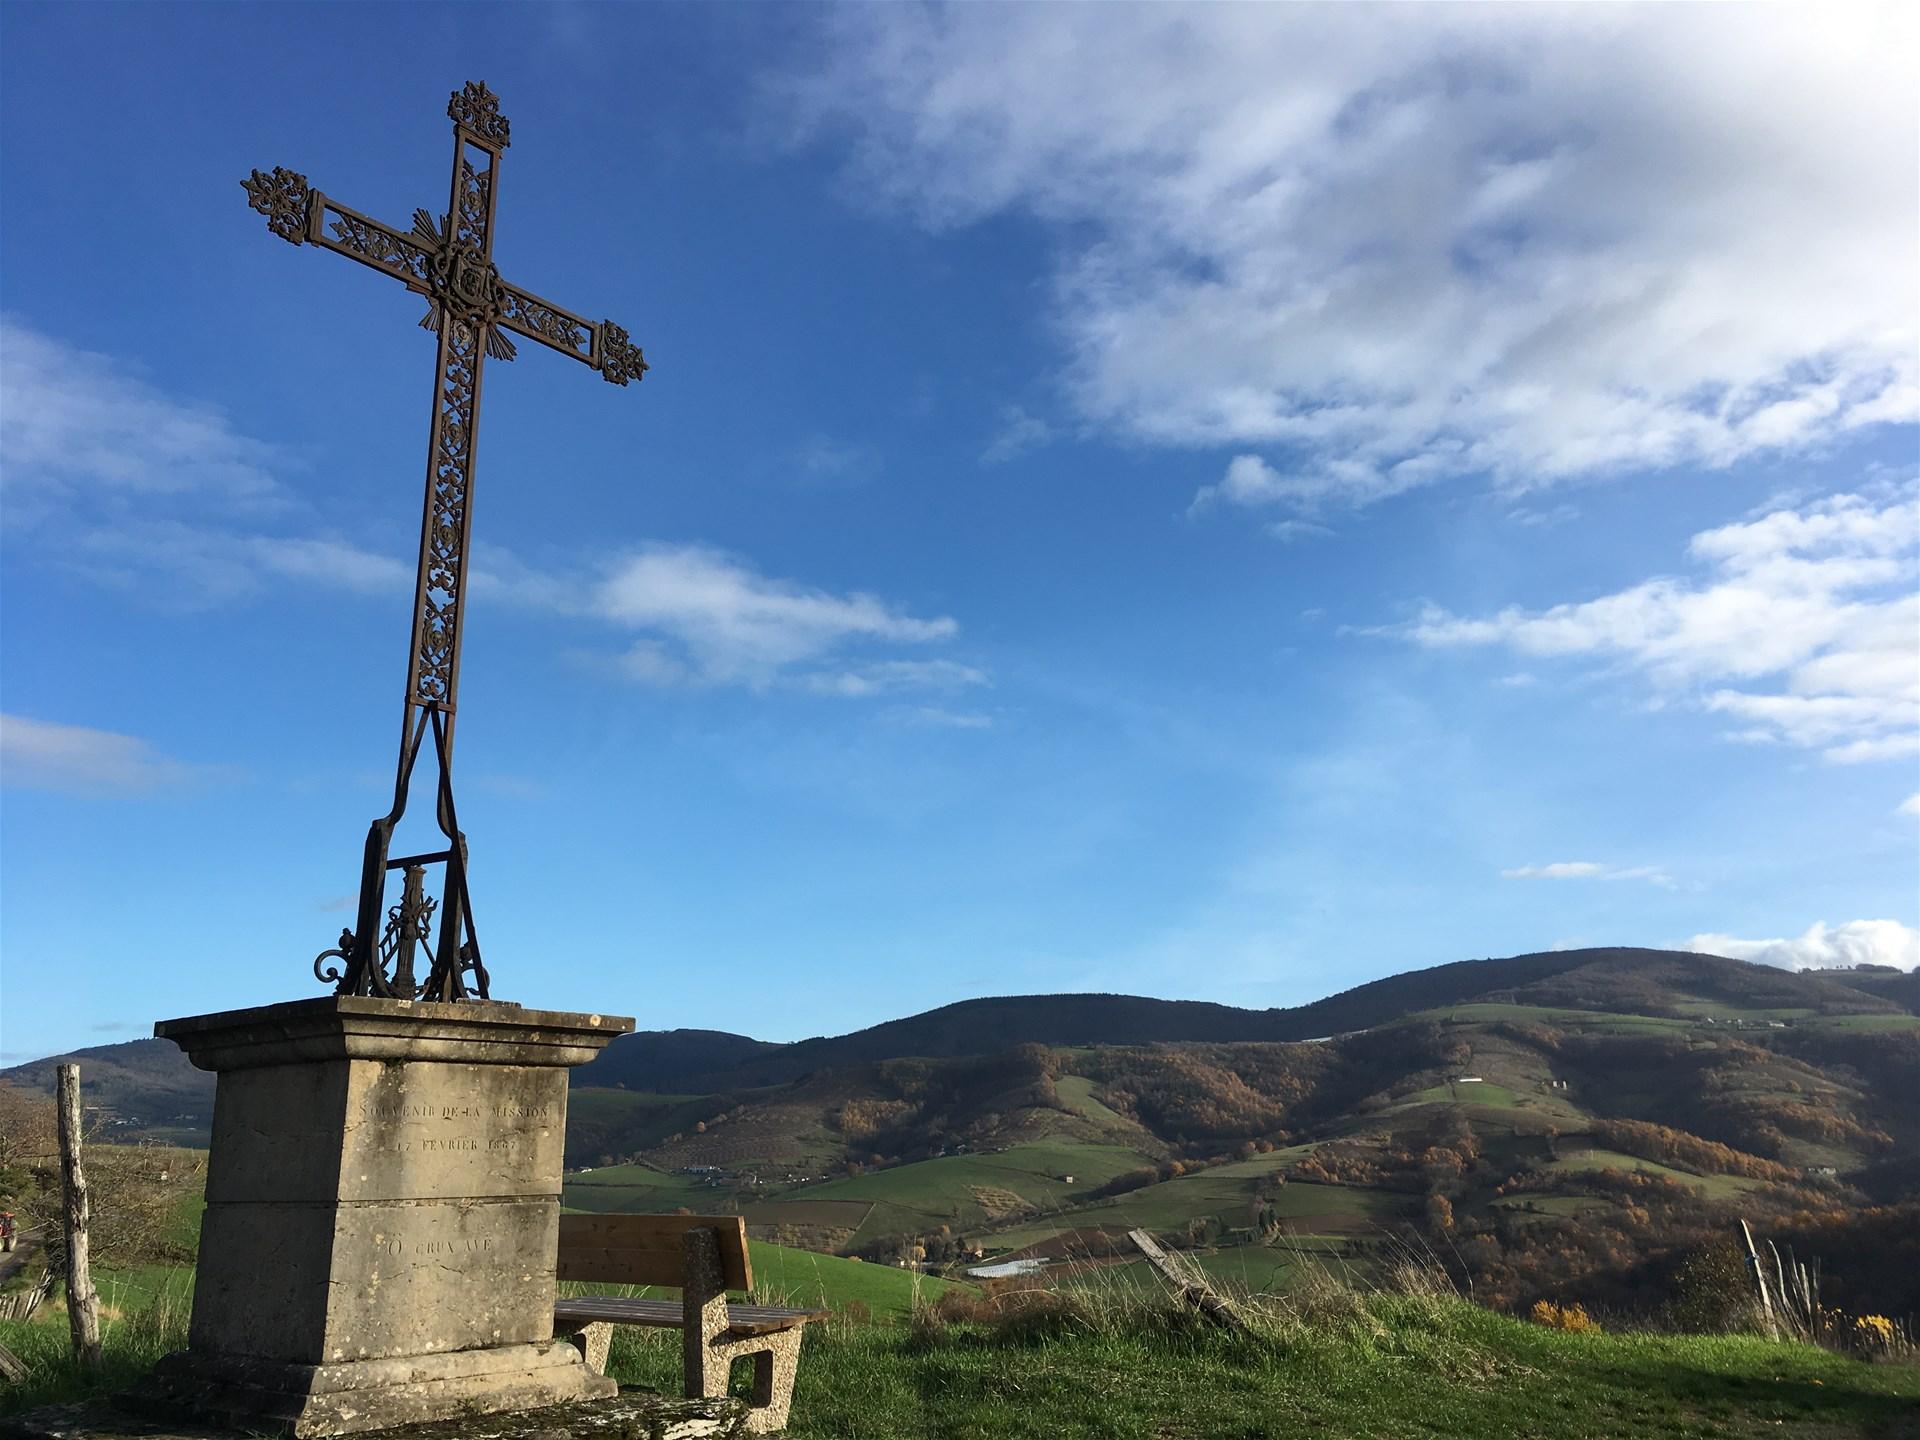 ffrandonnee rhone chemin de montaigne brussieu